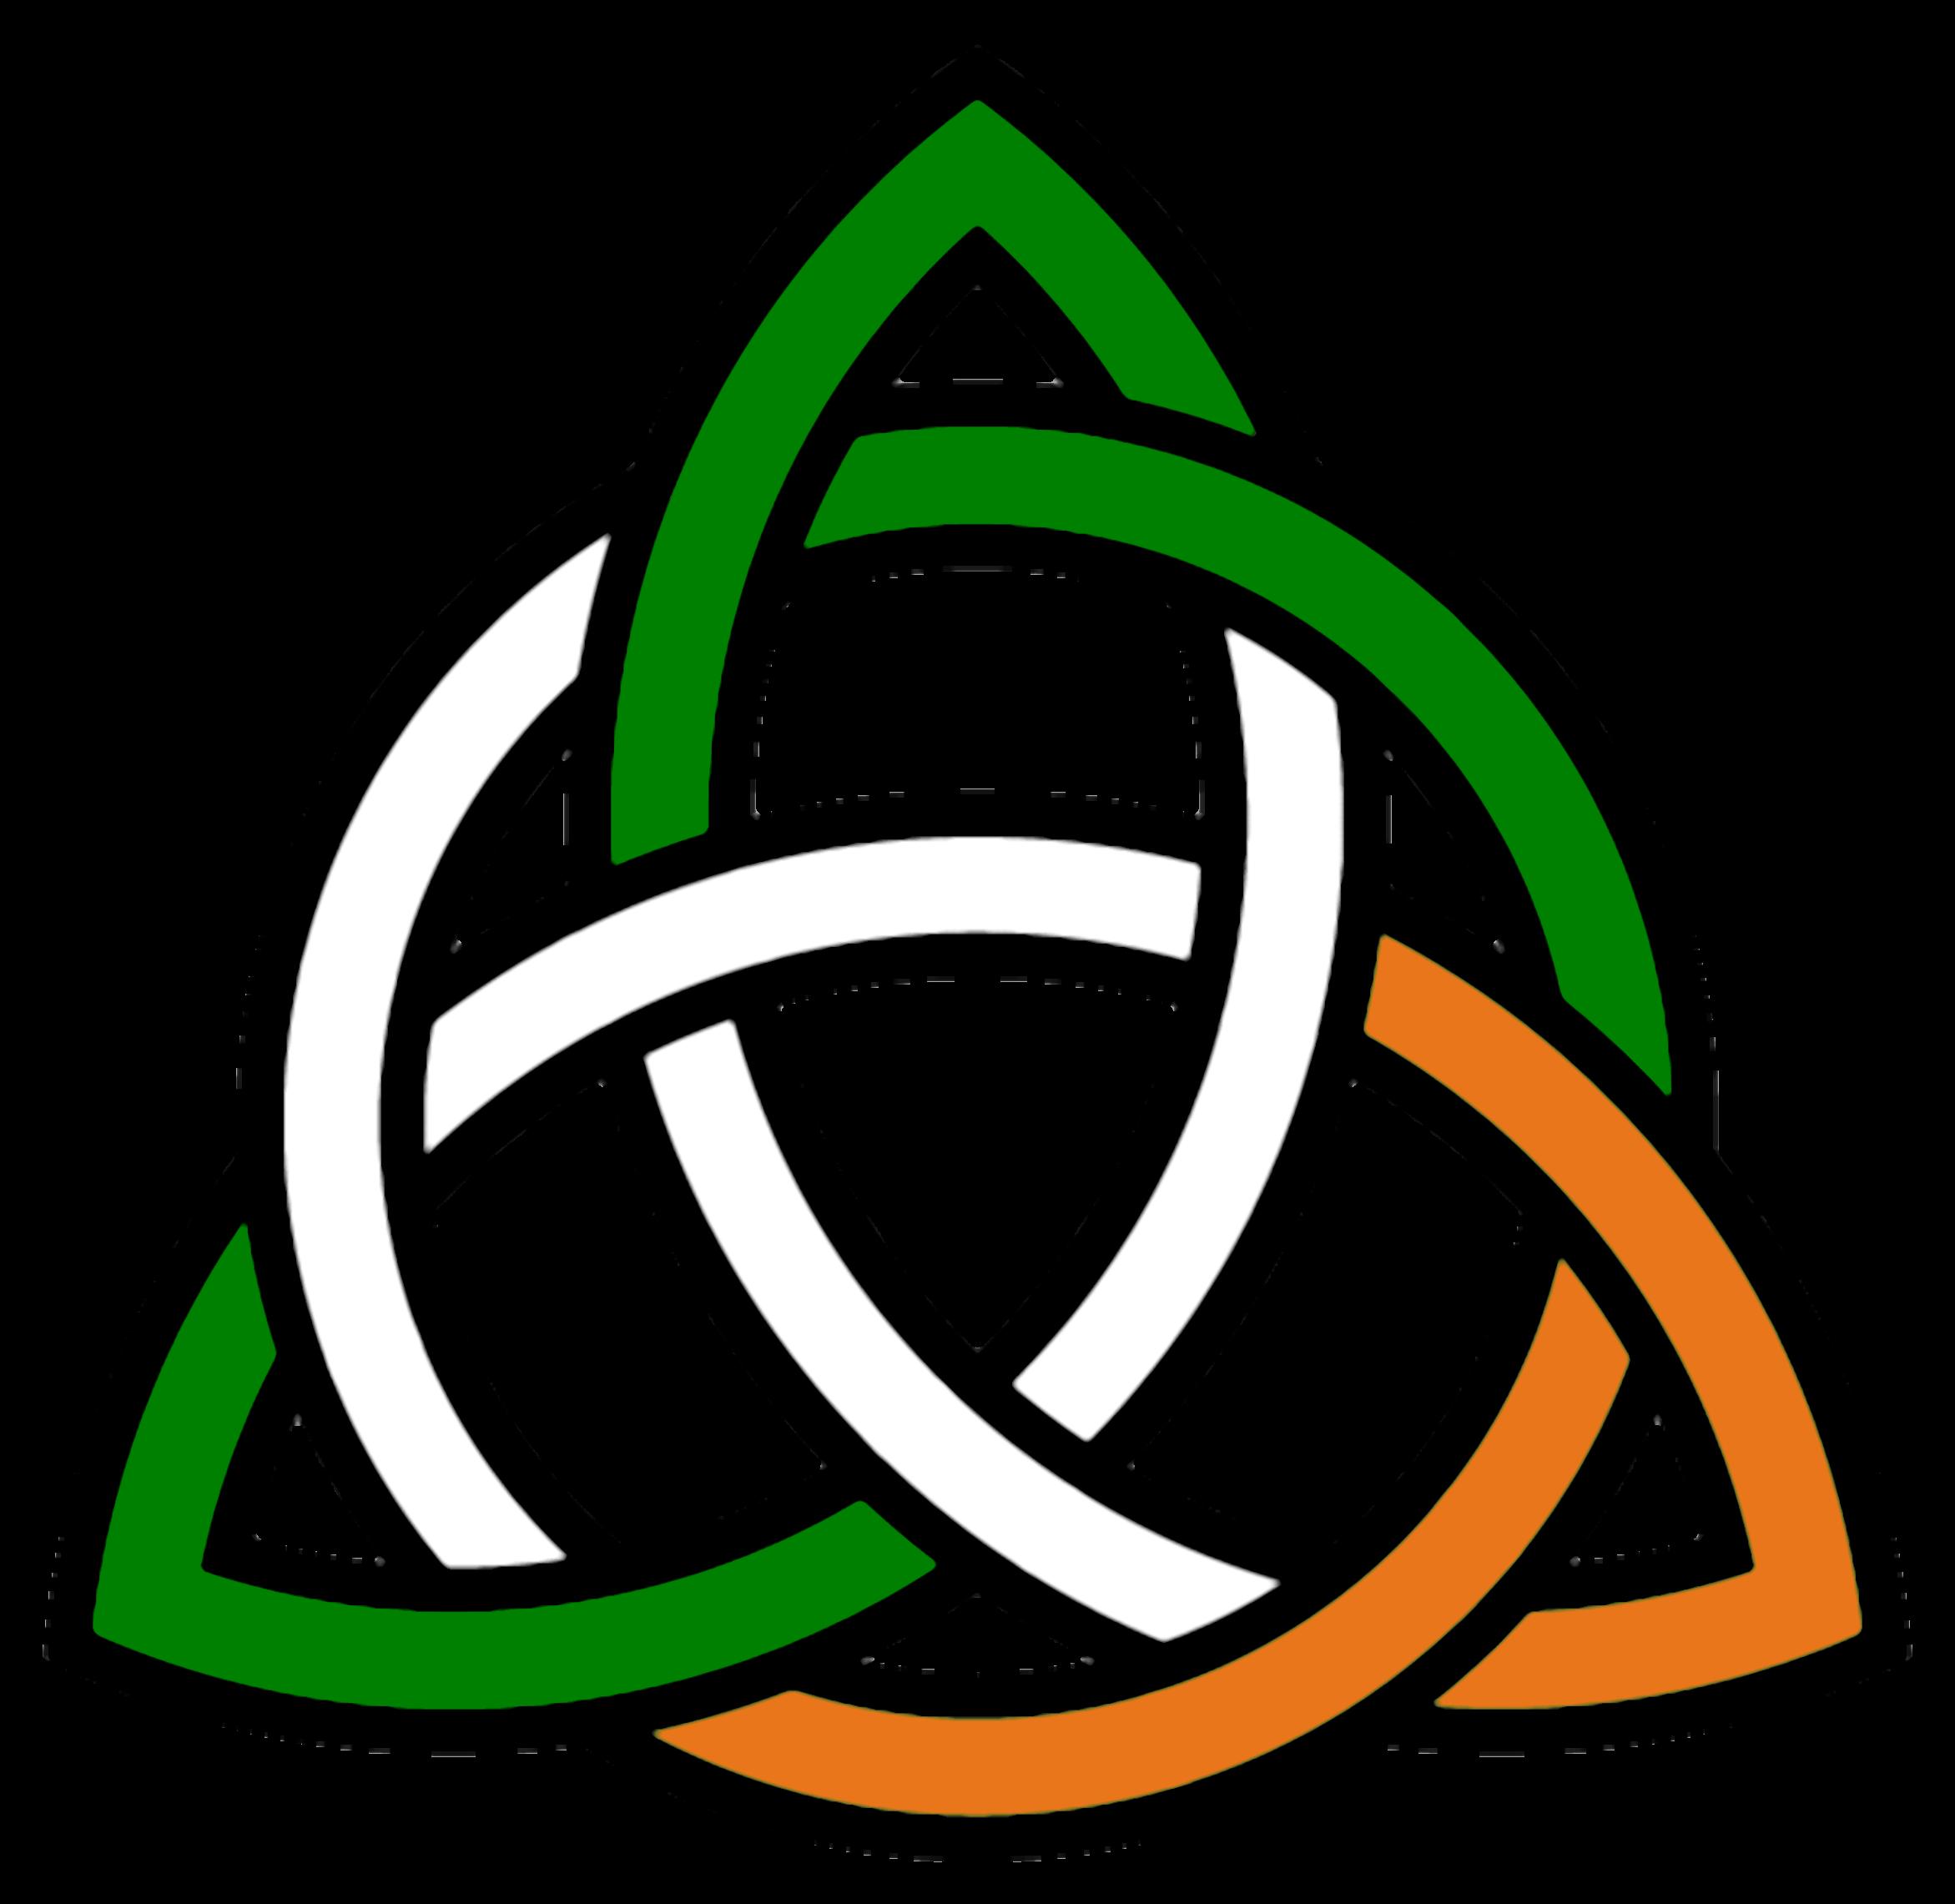 Celtic trinity knot irish. Flag clipart vector